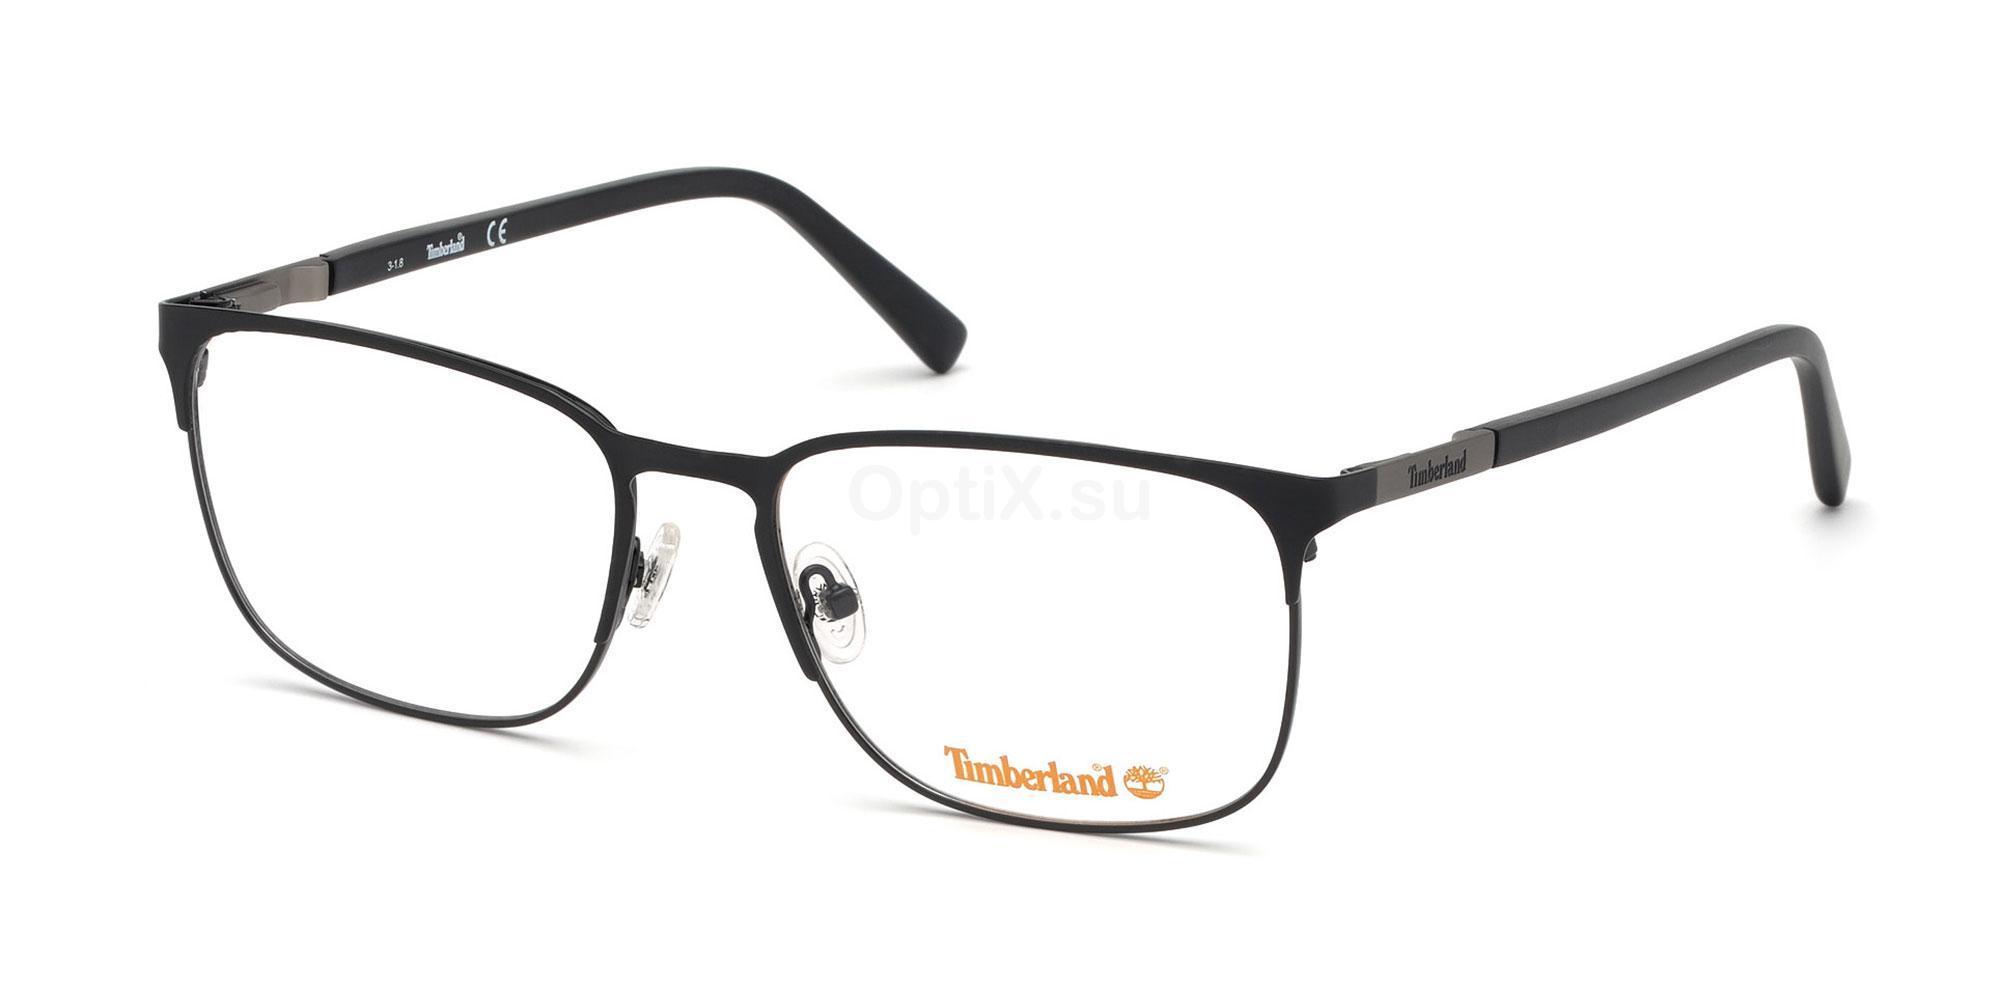 002 TB1620 Glasses, Timberland